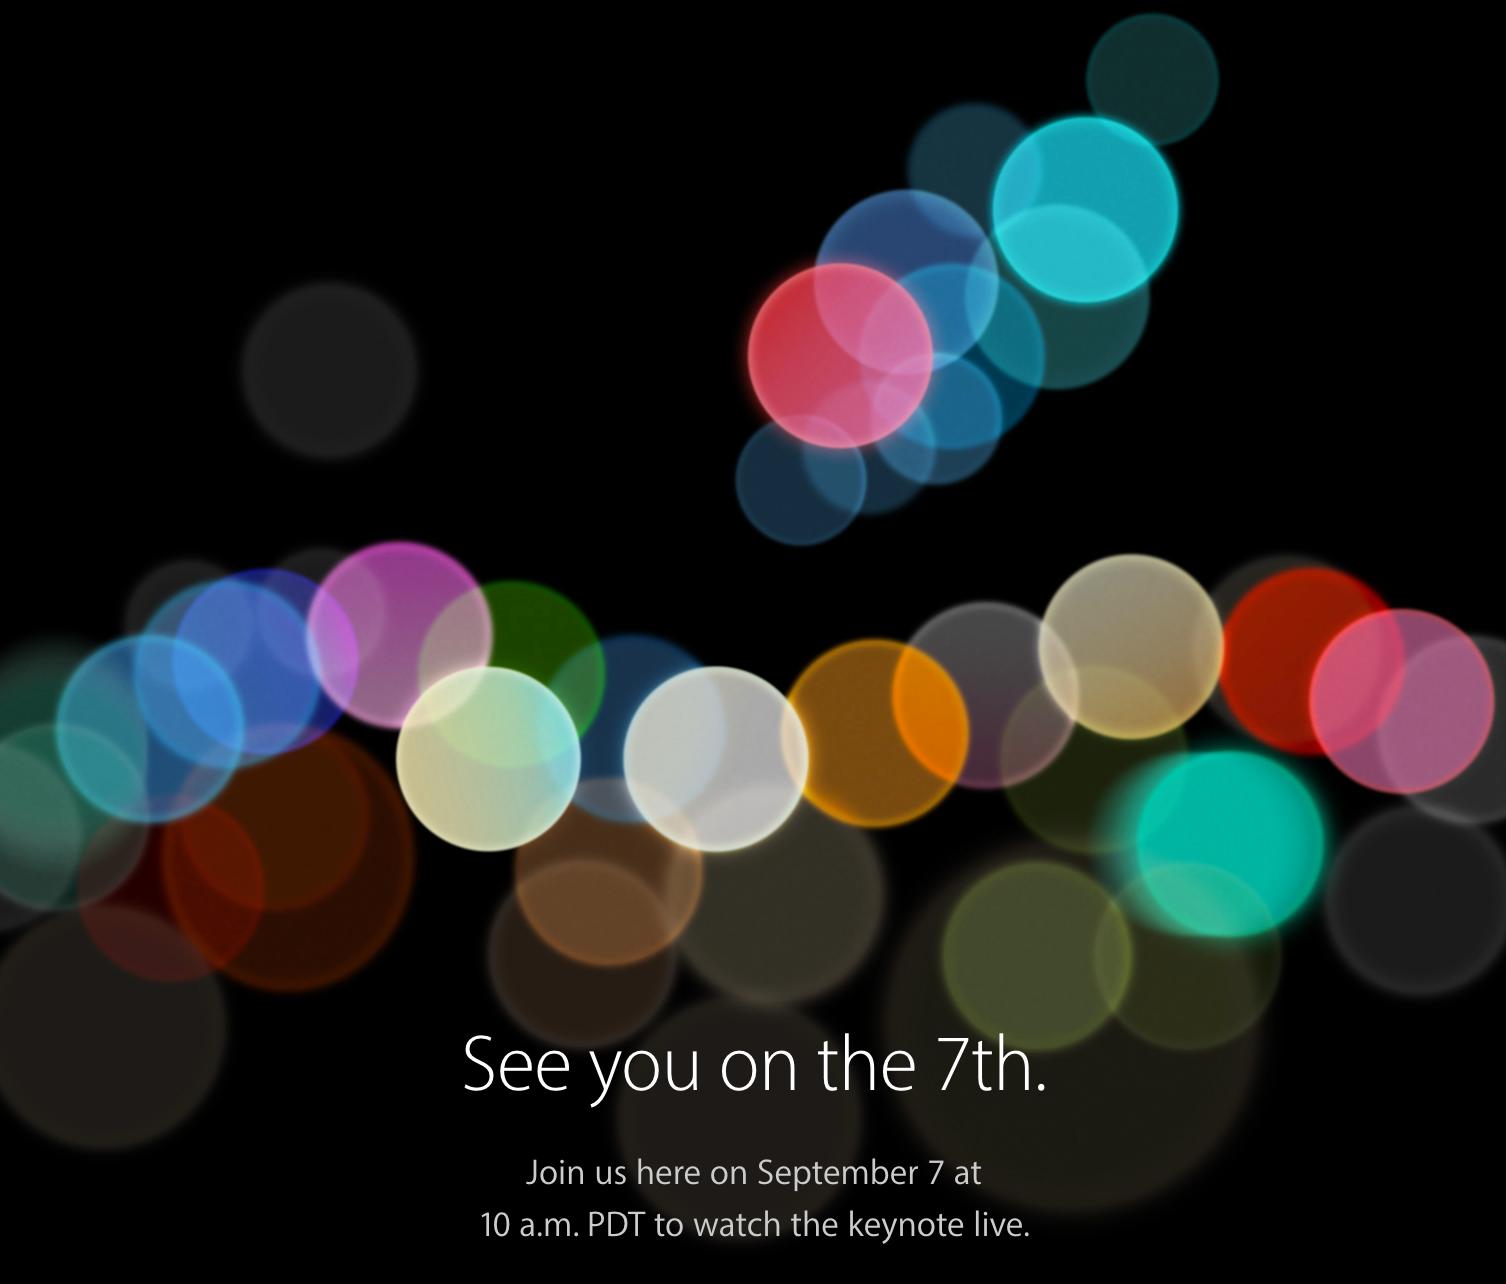 Apple_Events_-_Keynote_September_2016_-_Apple